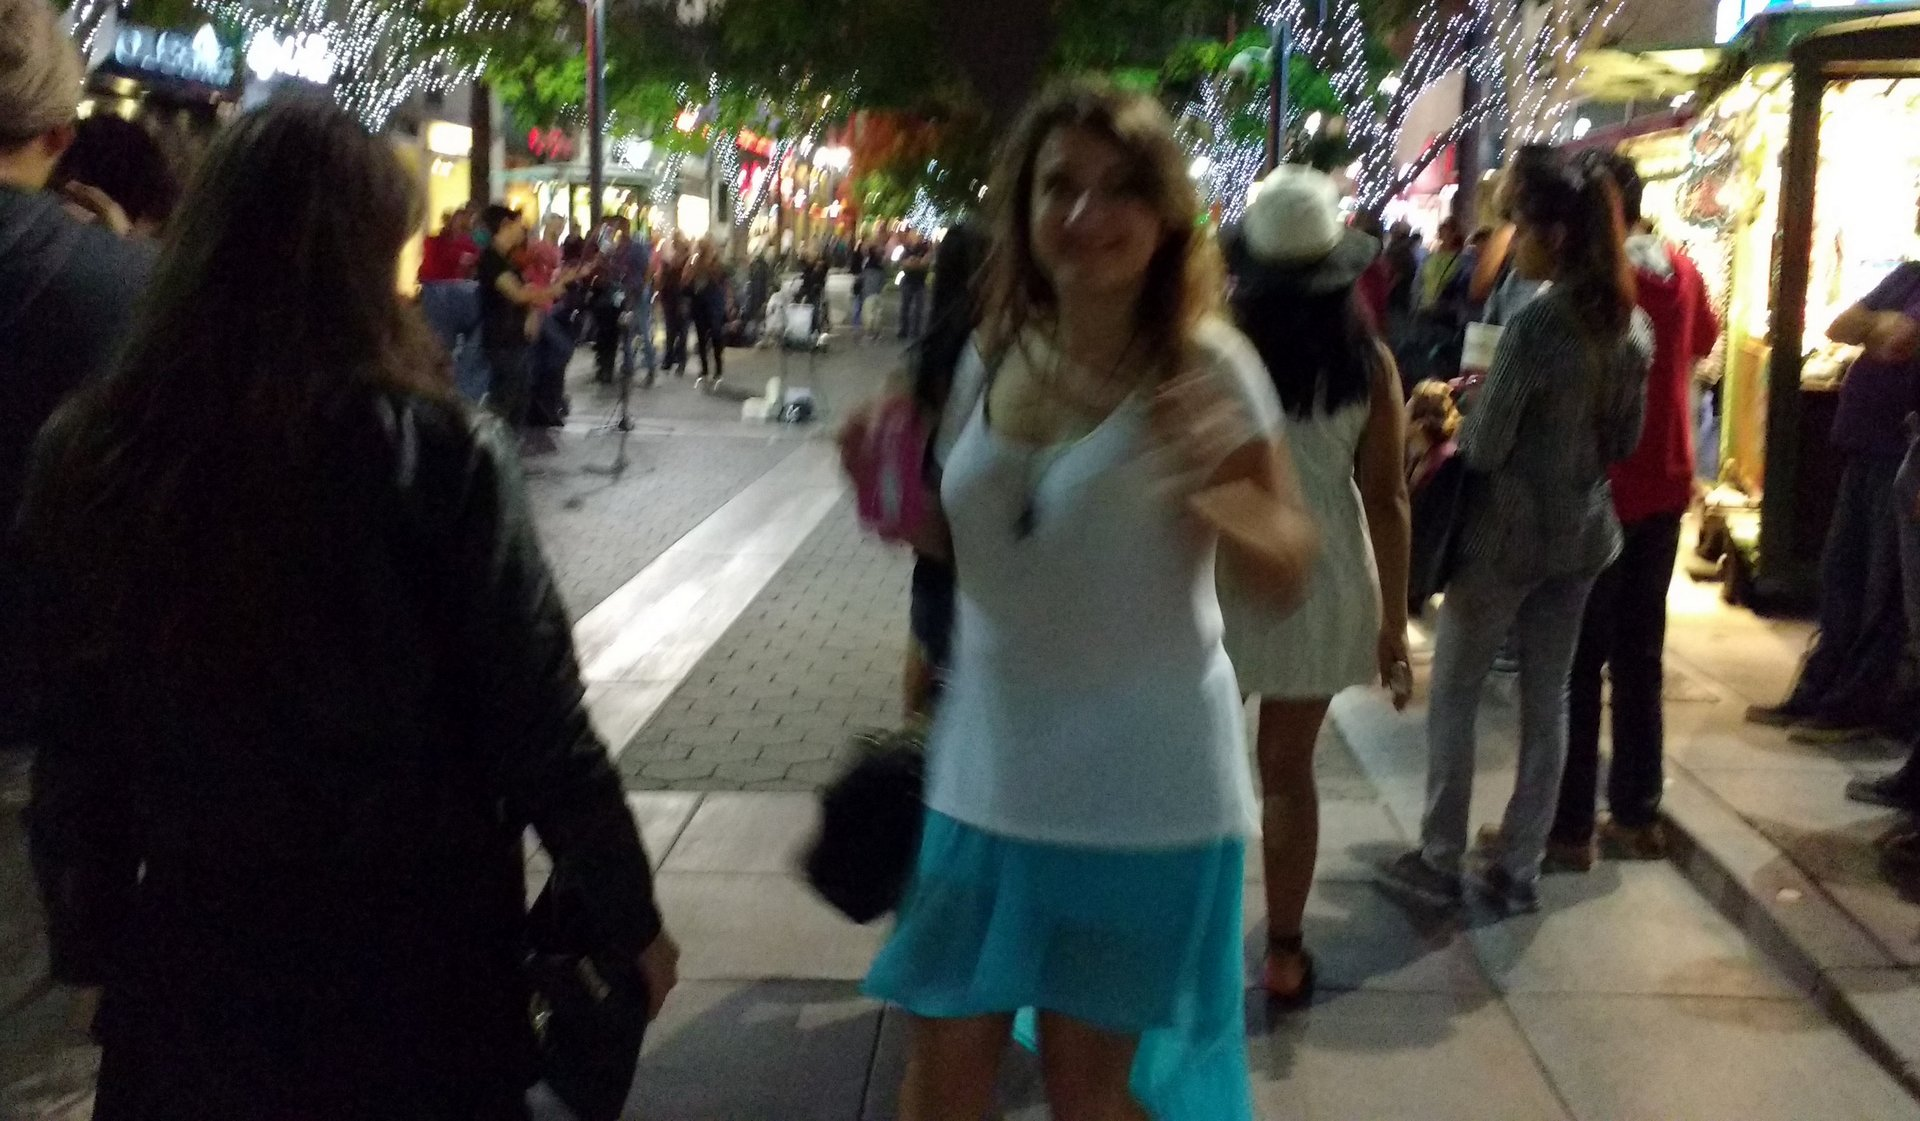 Elena dancing in the street at the 3rd Street Promenade in Santa Monica, CA